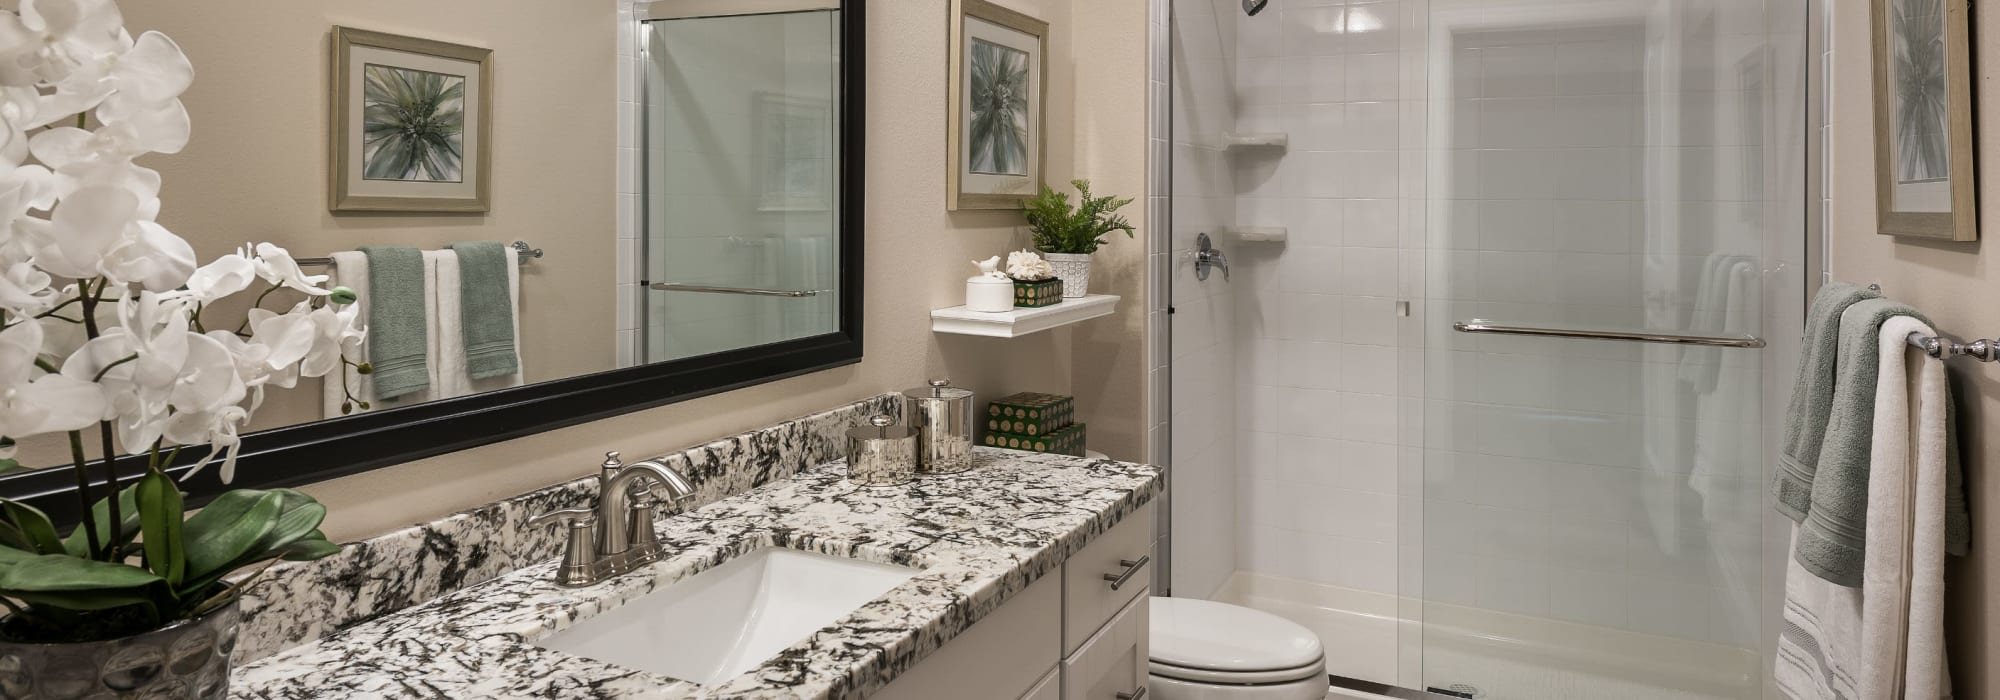 Bright bathroom at San Artes in Scottsdale, Arizona